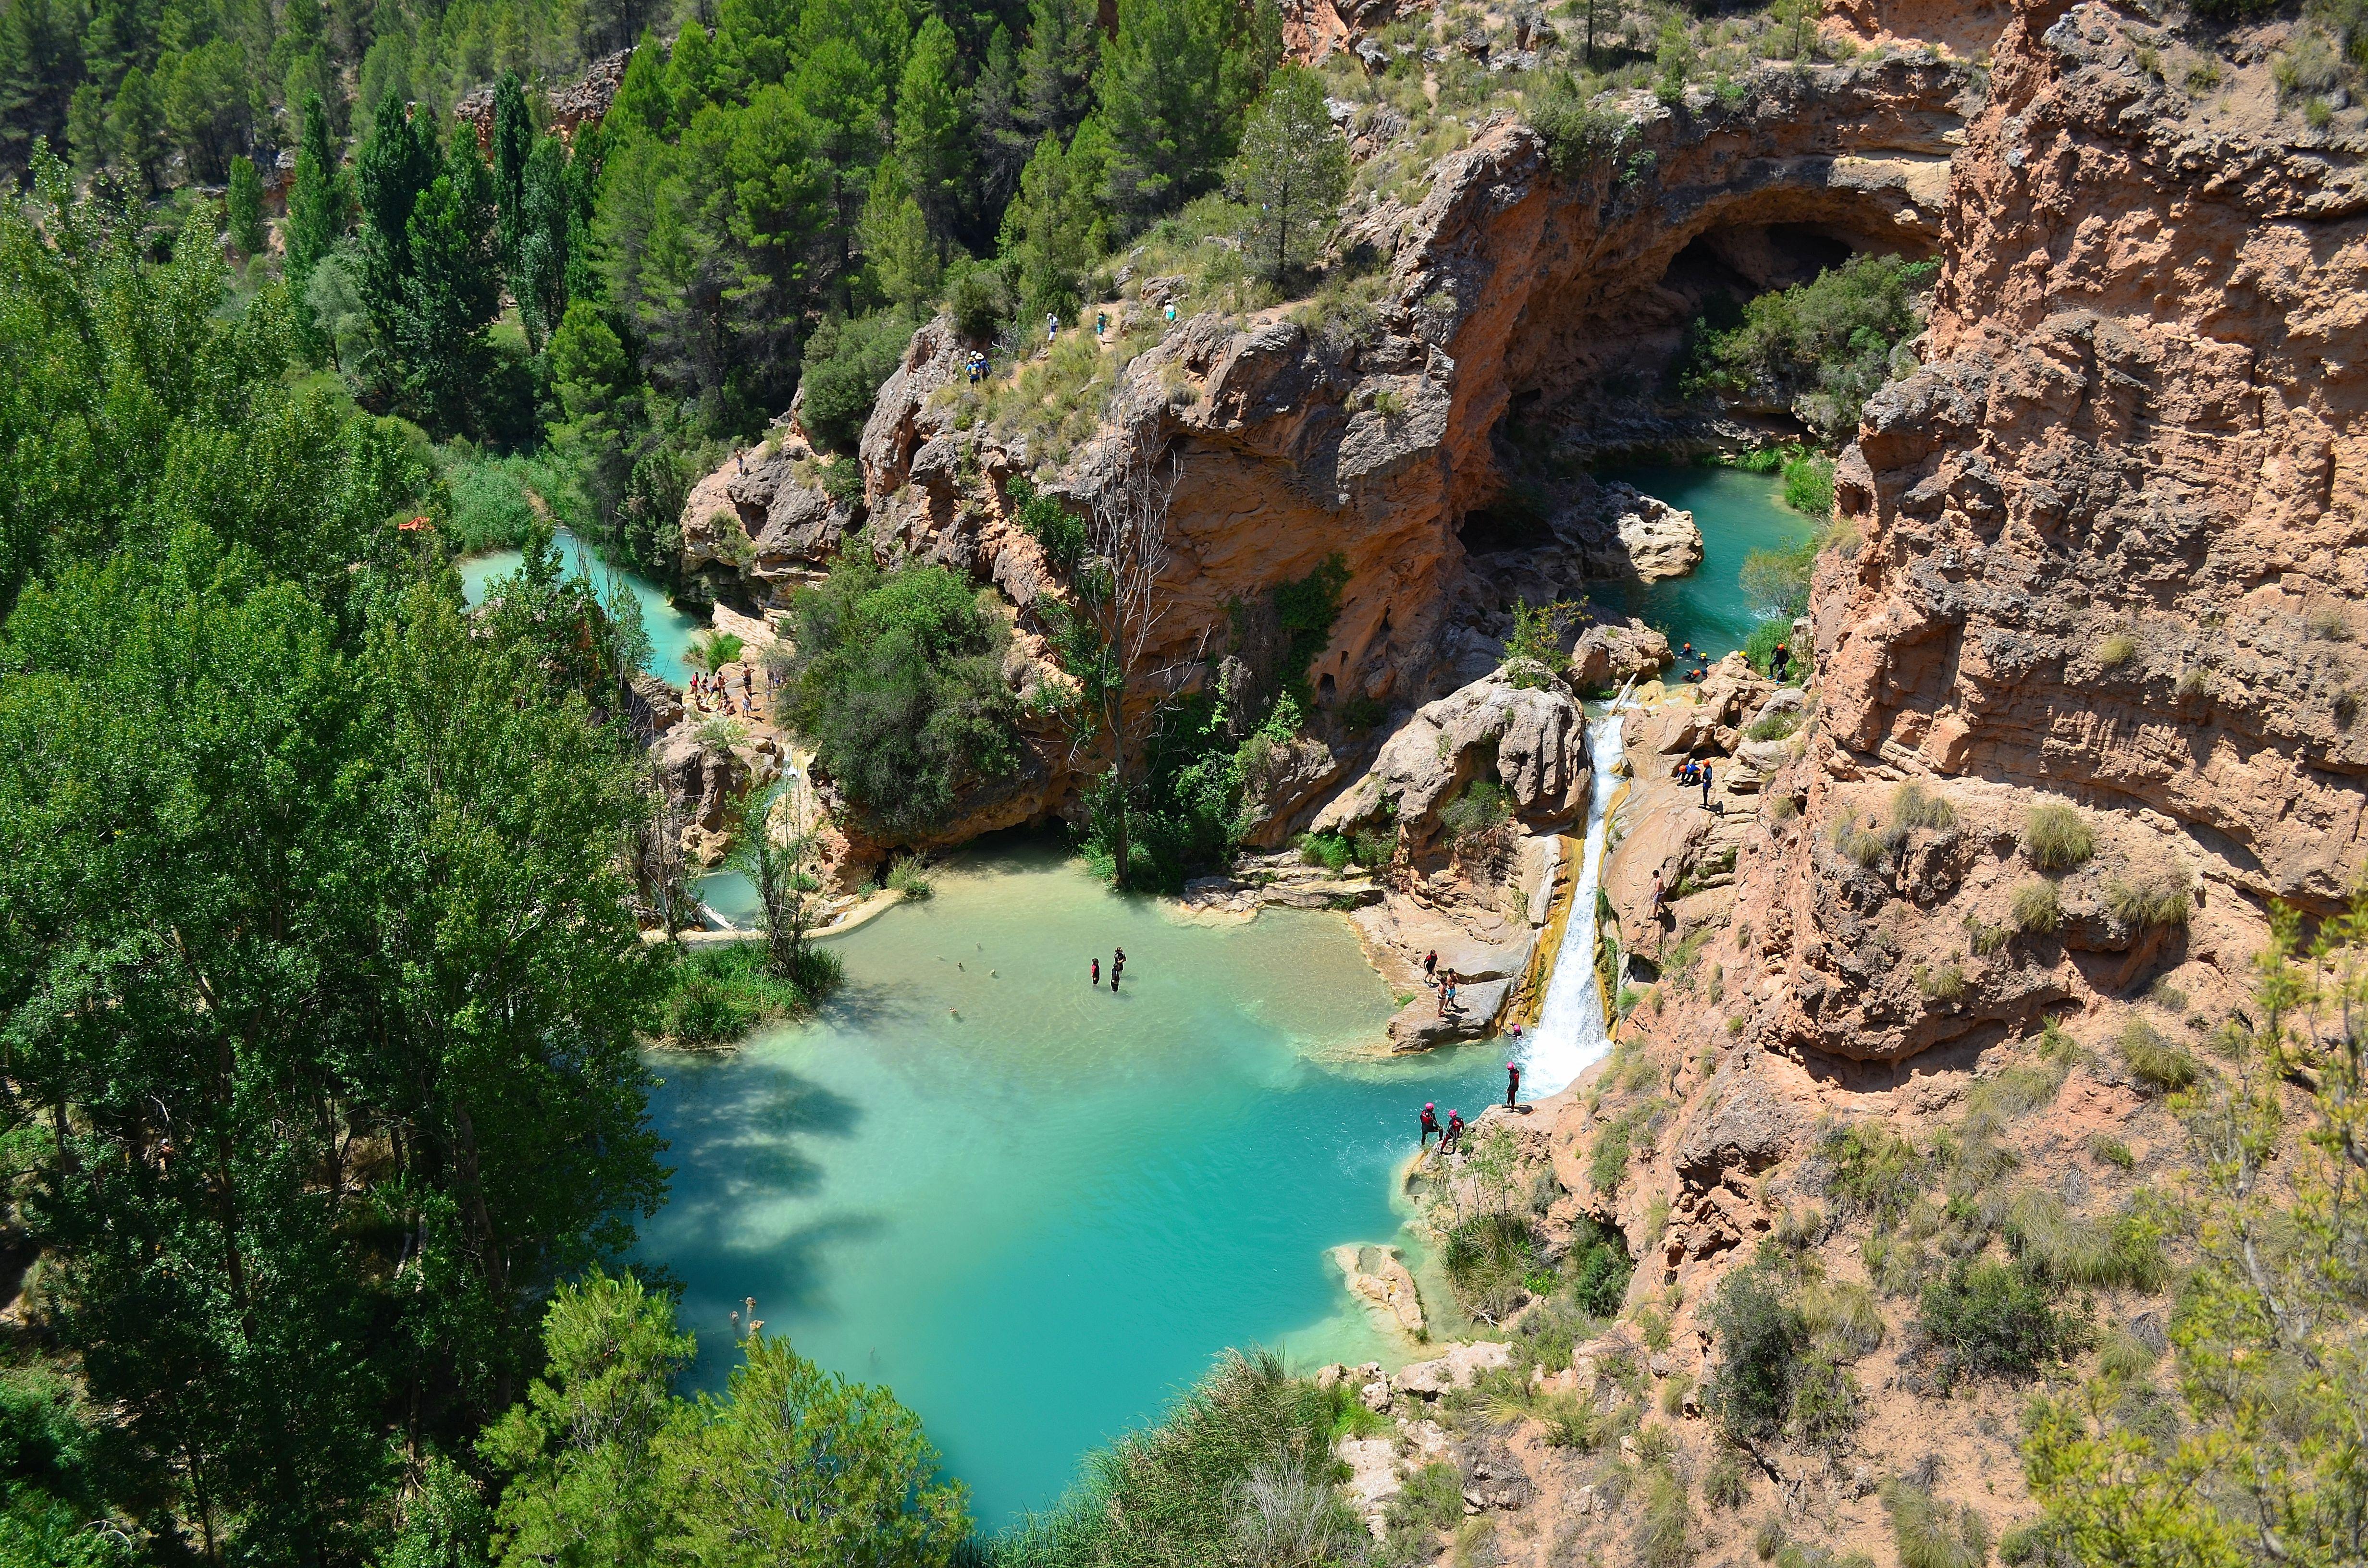 Top 10 piscinas naturales de agua dulce y salada ecolobox for Piscinas naturales rio malo